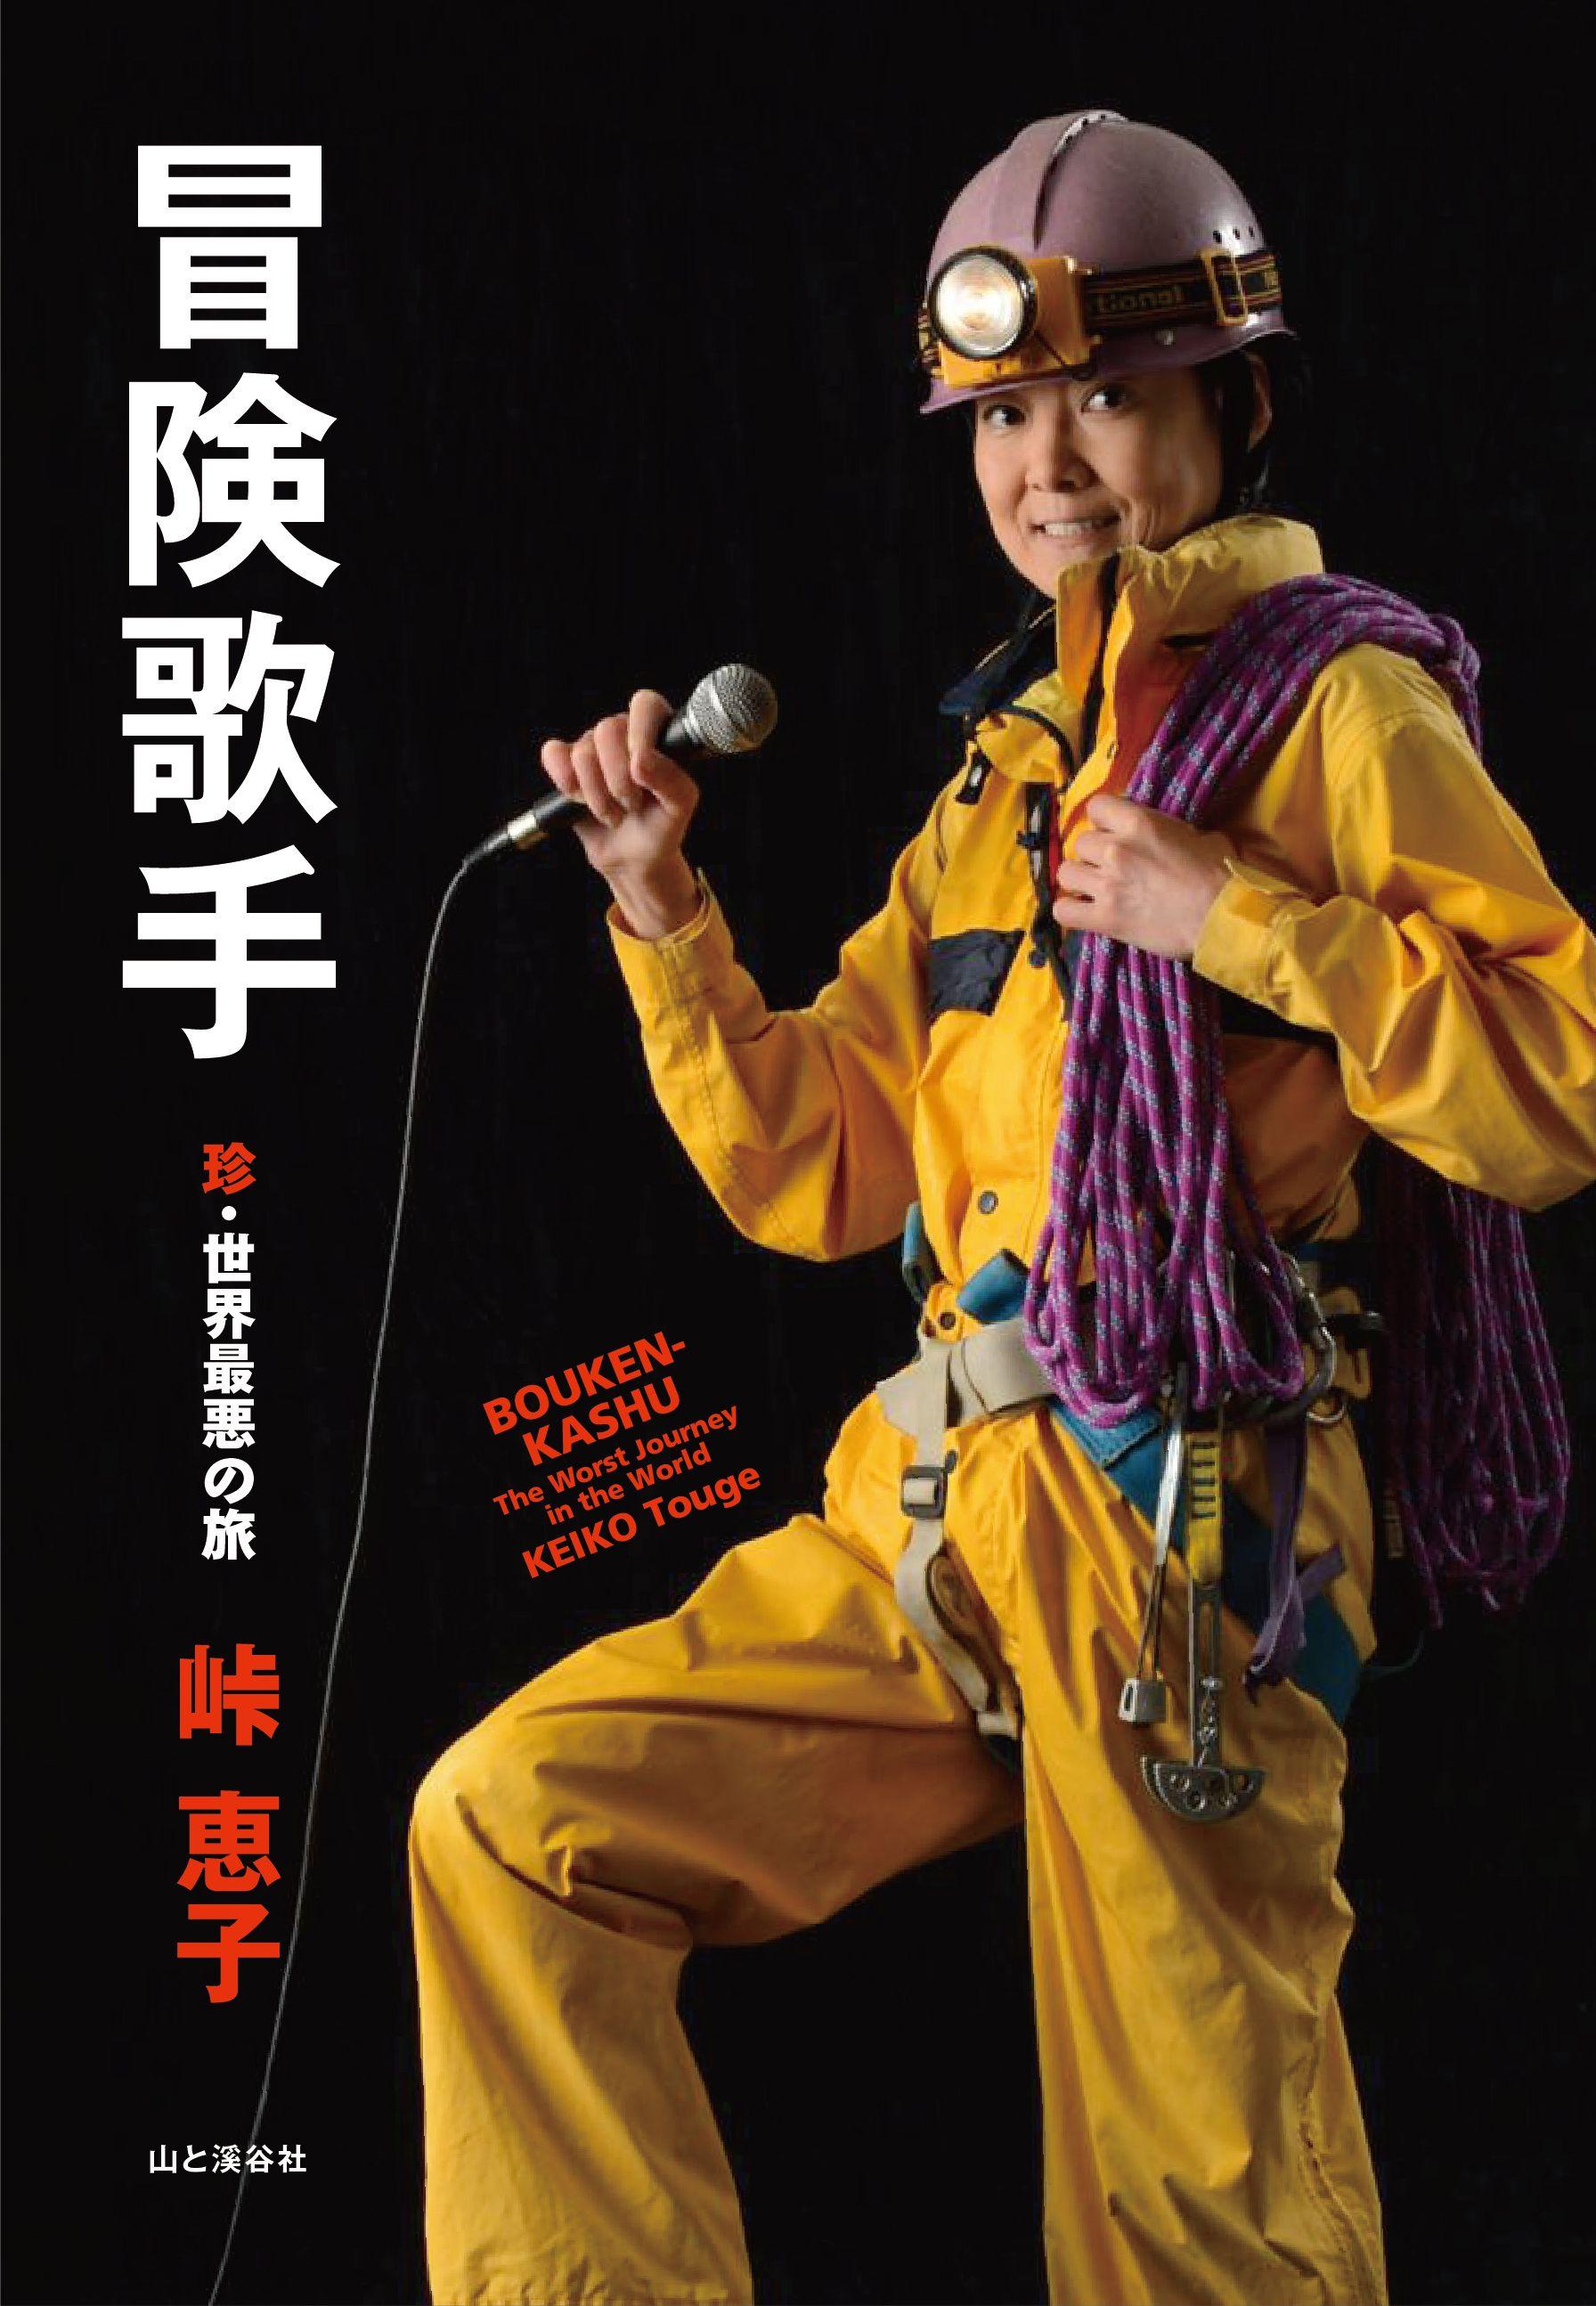 http://www.yamakei.co.jp/news/boukenkashu.jpg